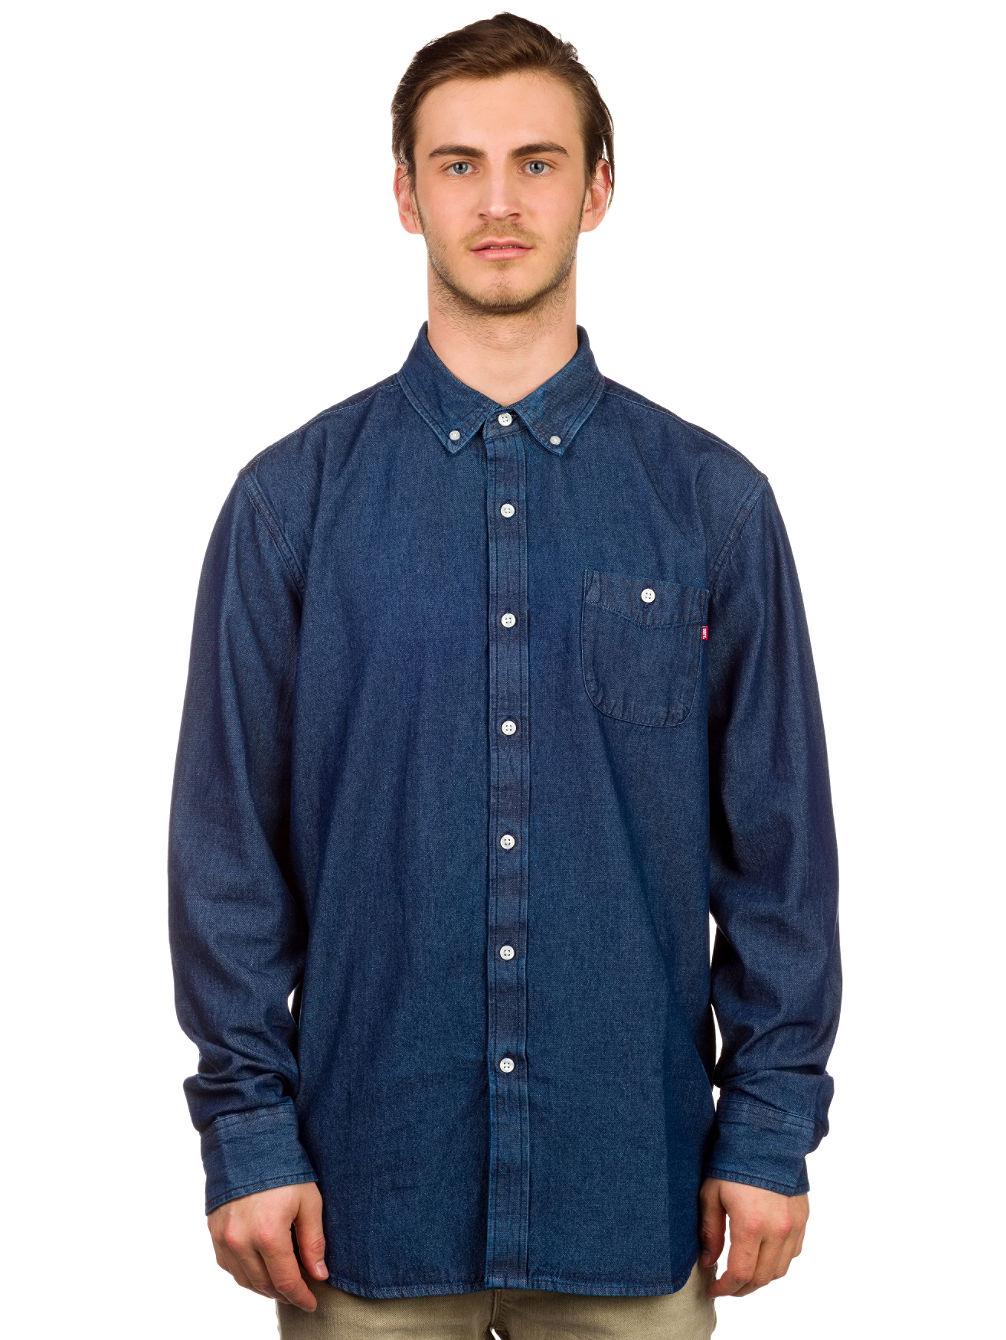 commerce-dissent-woven-shirt-ls